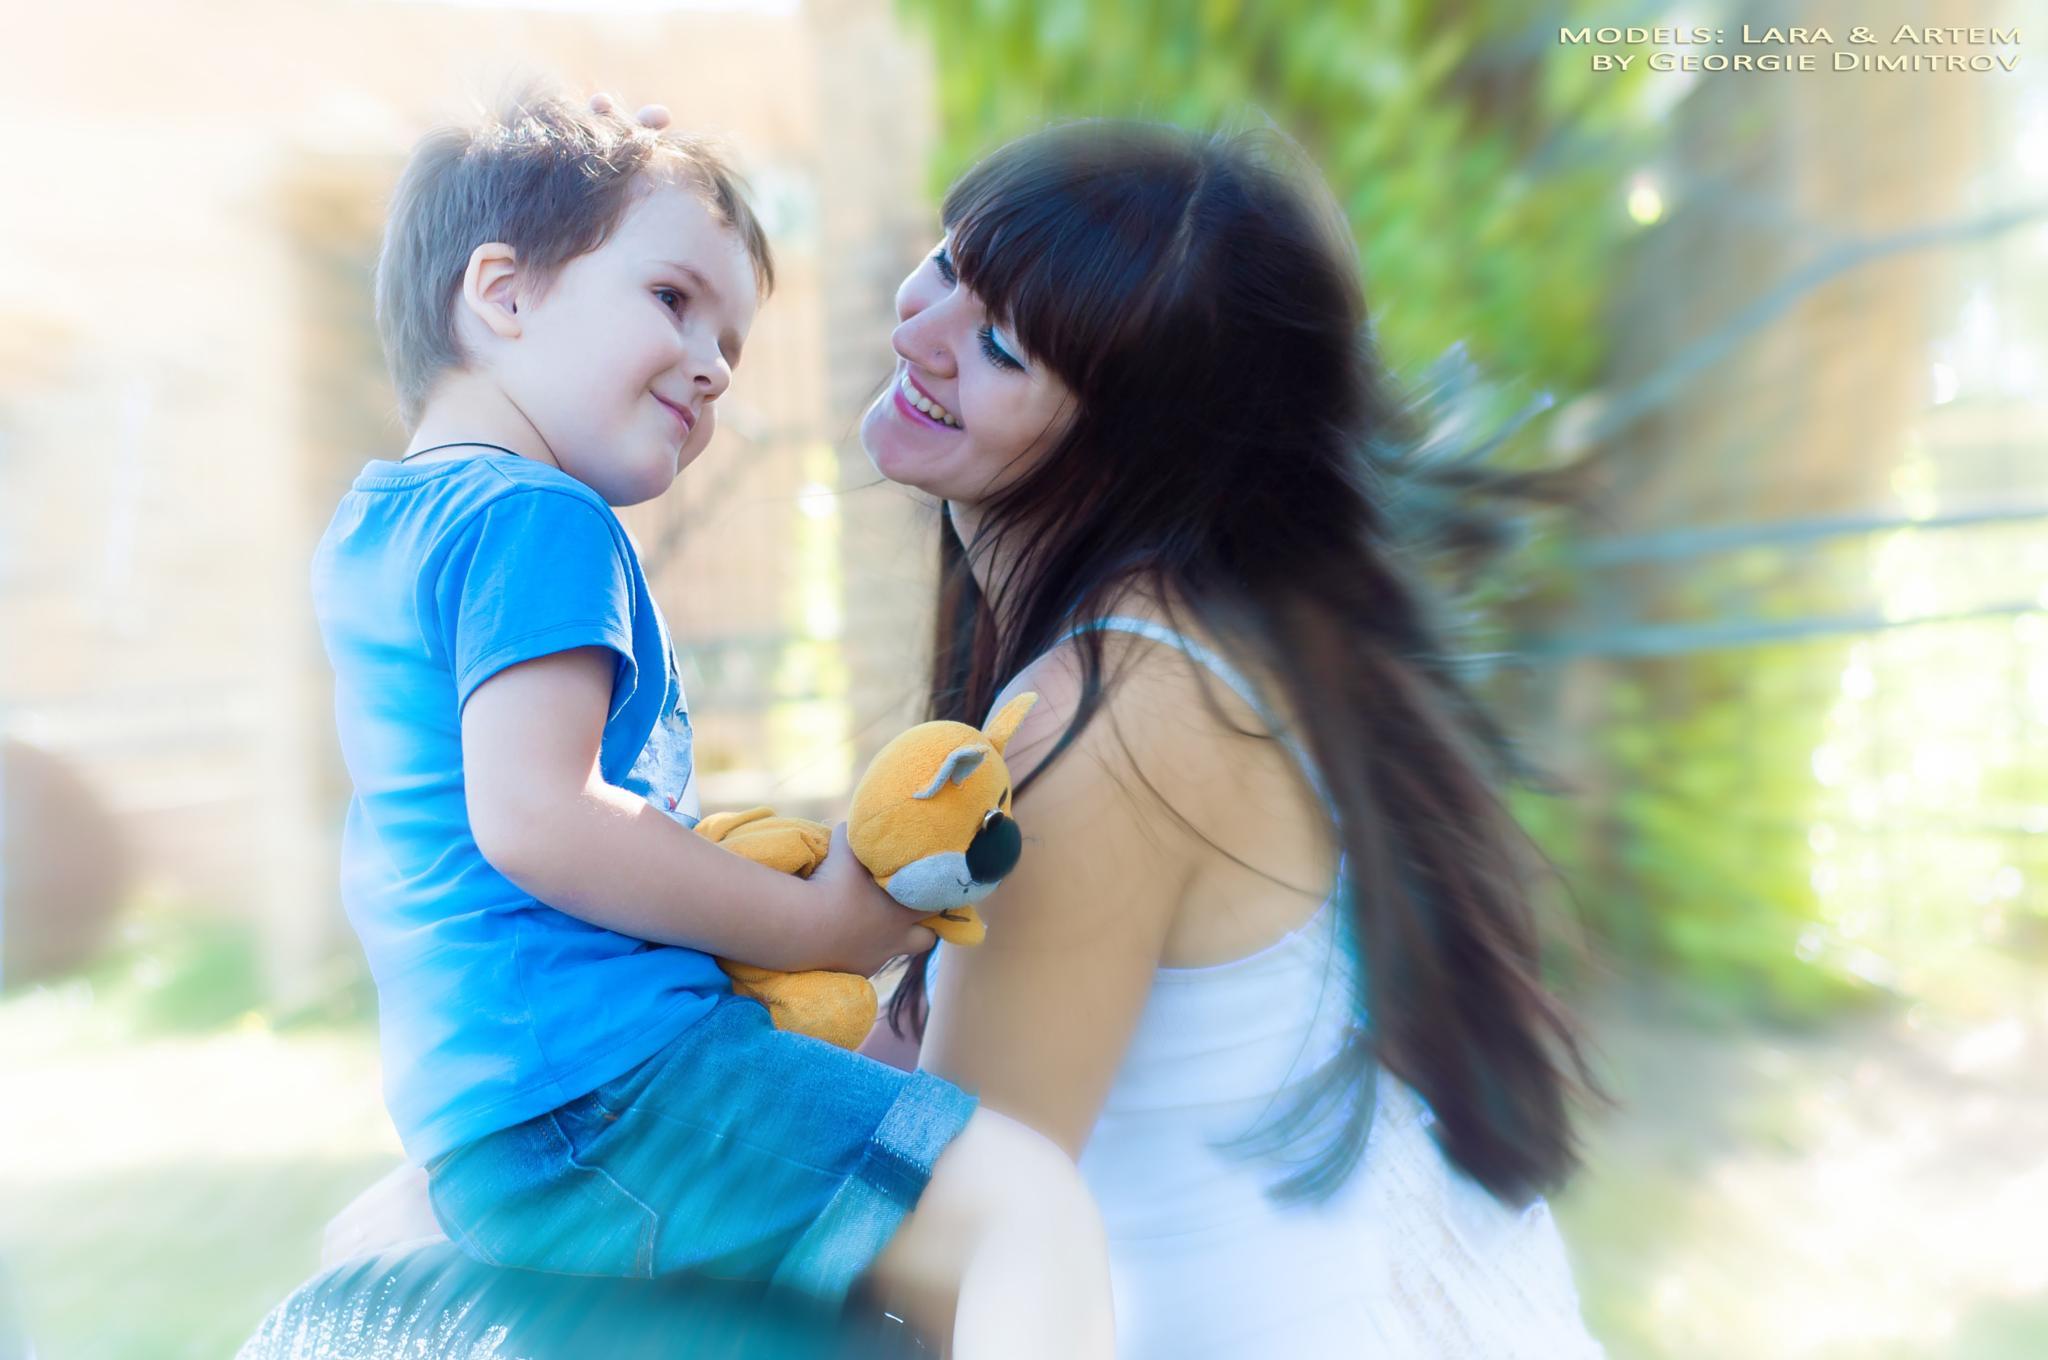 Mother's love by Georgie Dimitrov